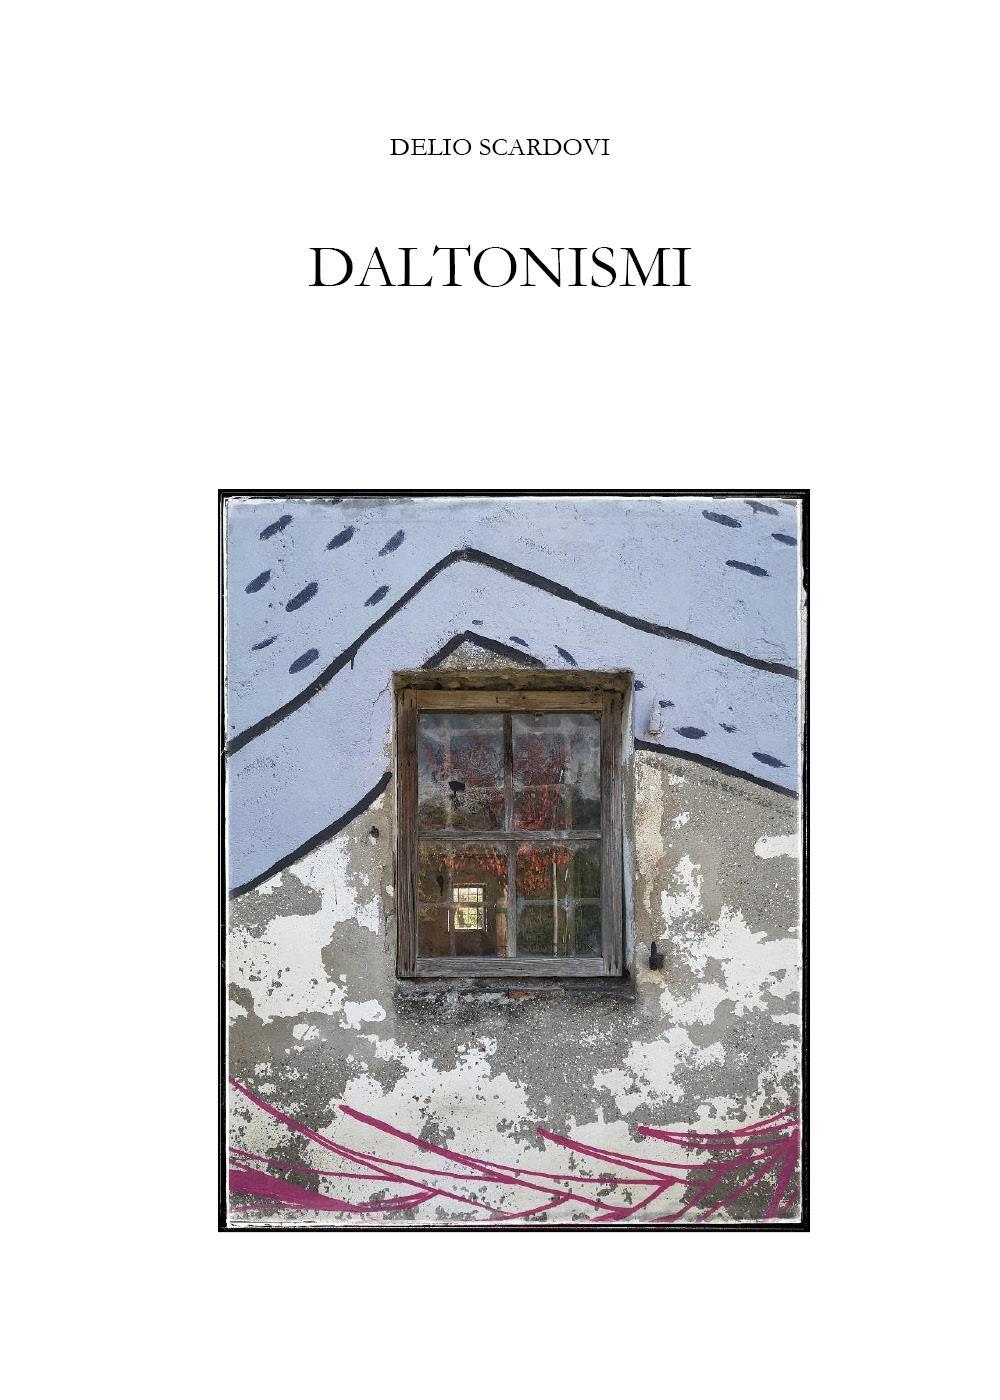 Daltonismi